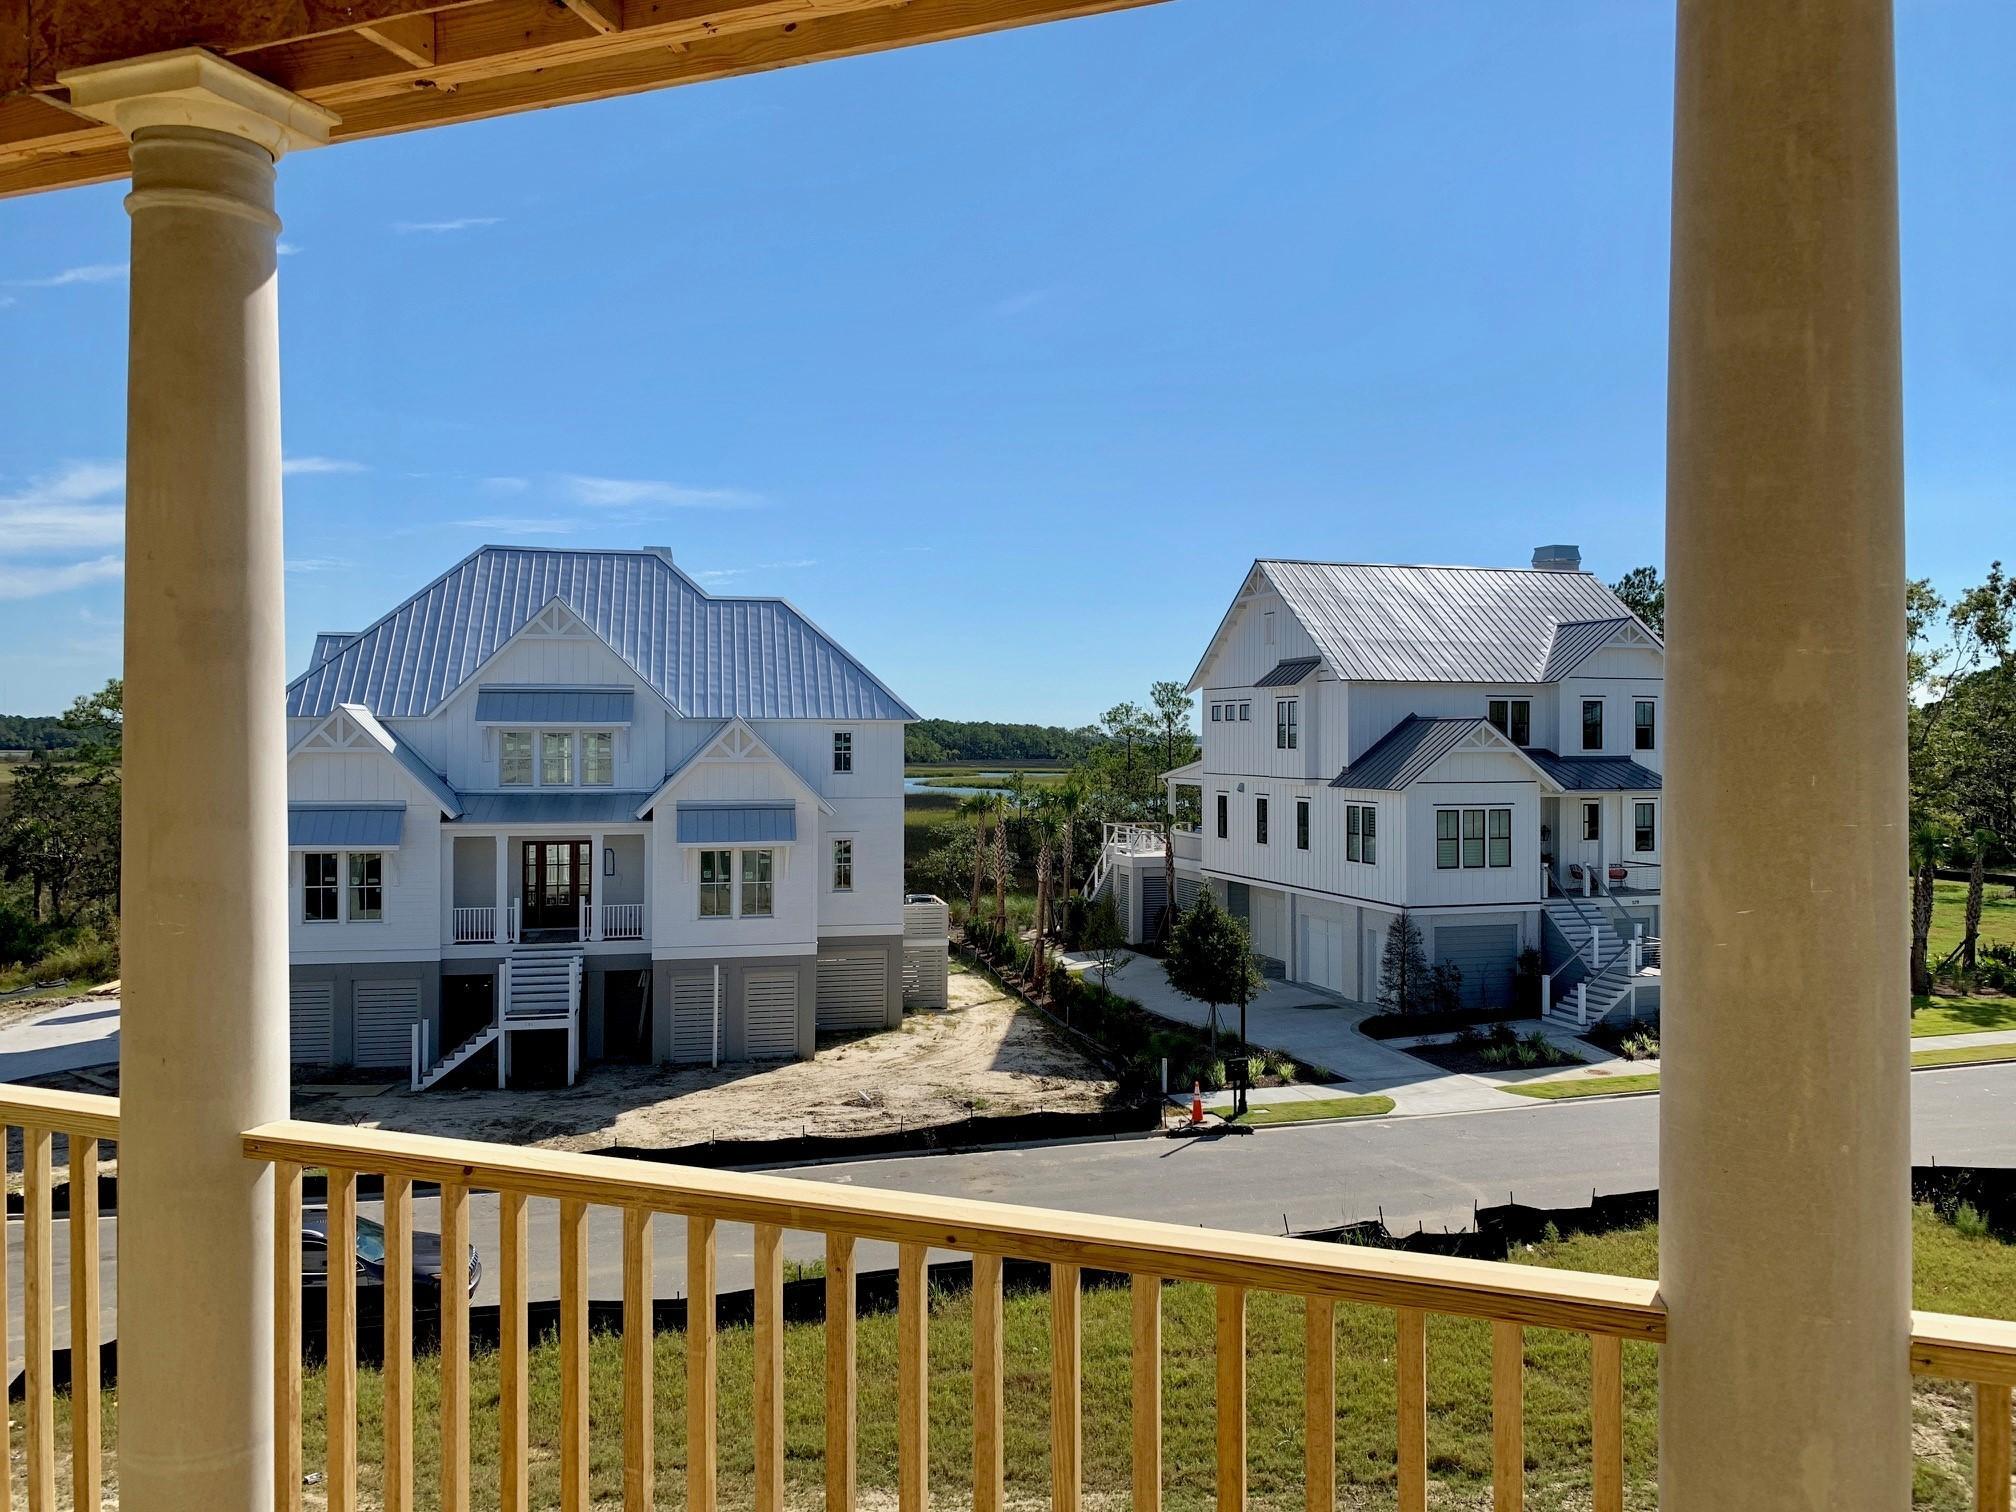 Daniel Island Homes For Sale - 206 Foundry, Charleston, SC - 10